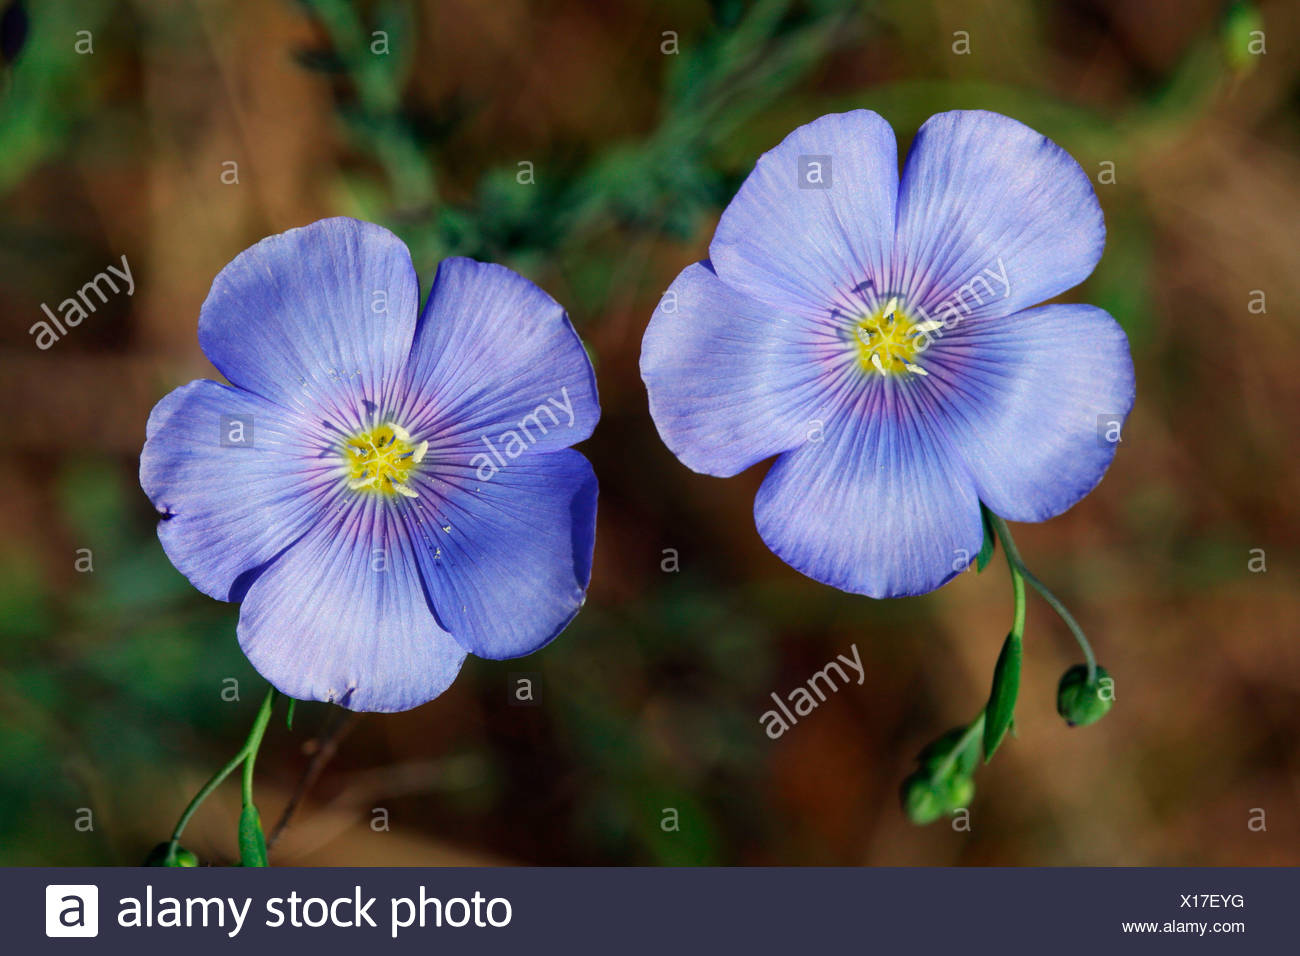 Perennial Flax, Blue flax, (Linum perenne) - Stock Image